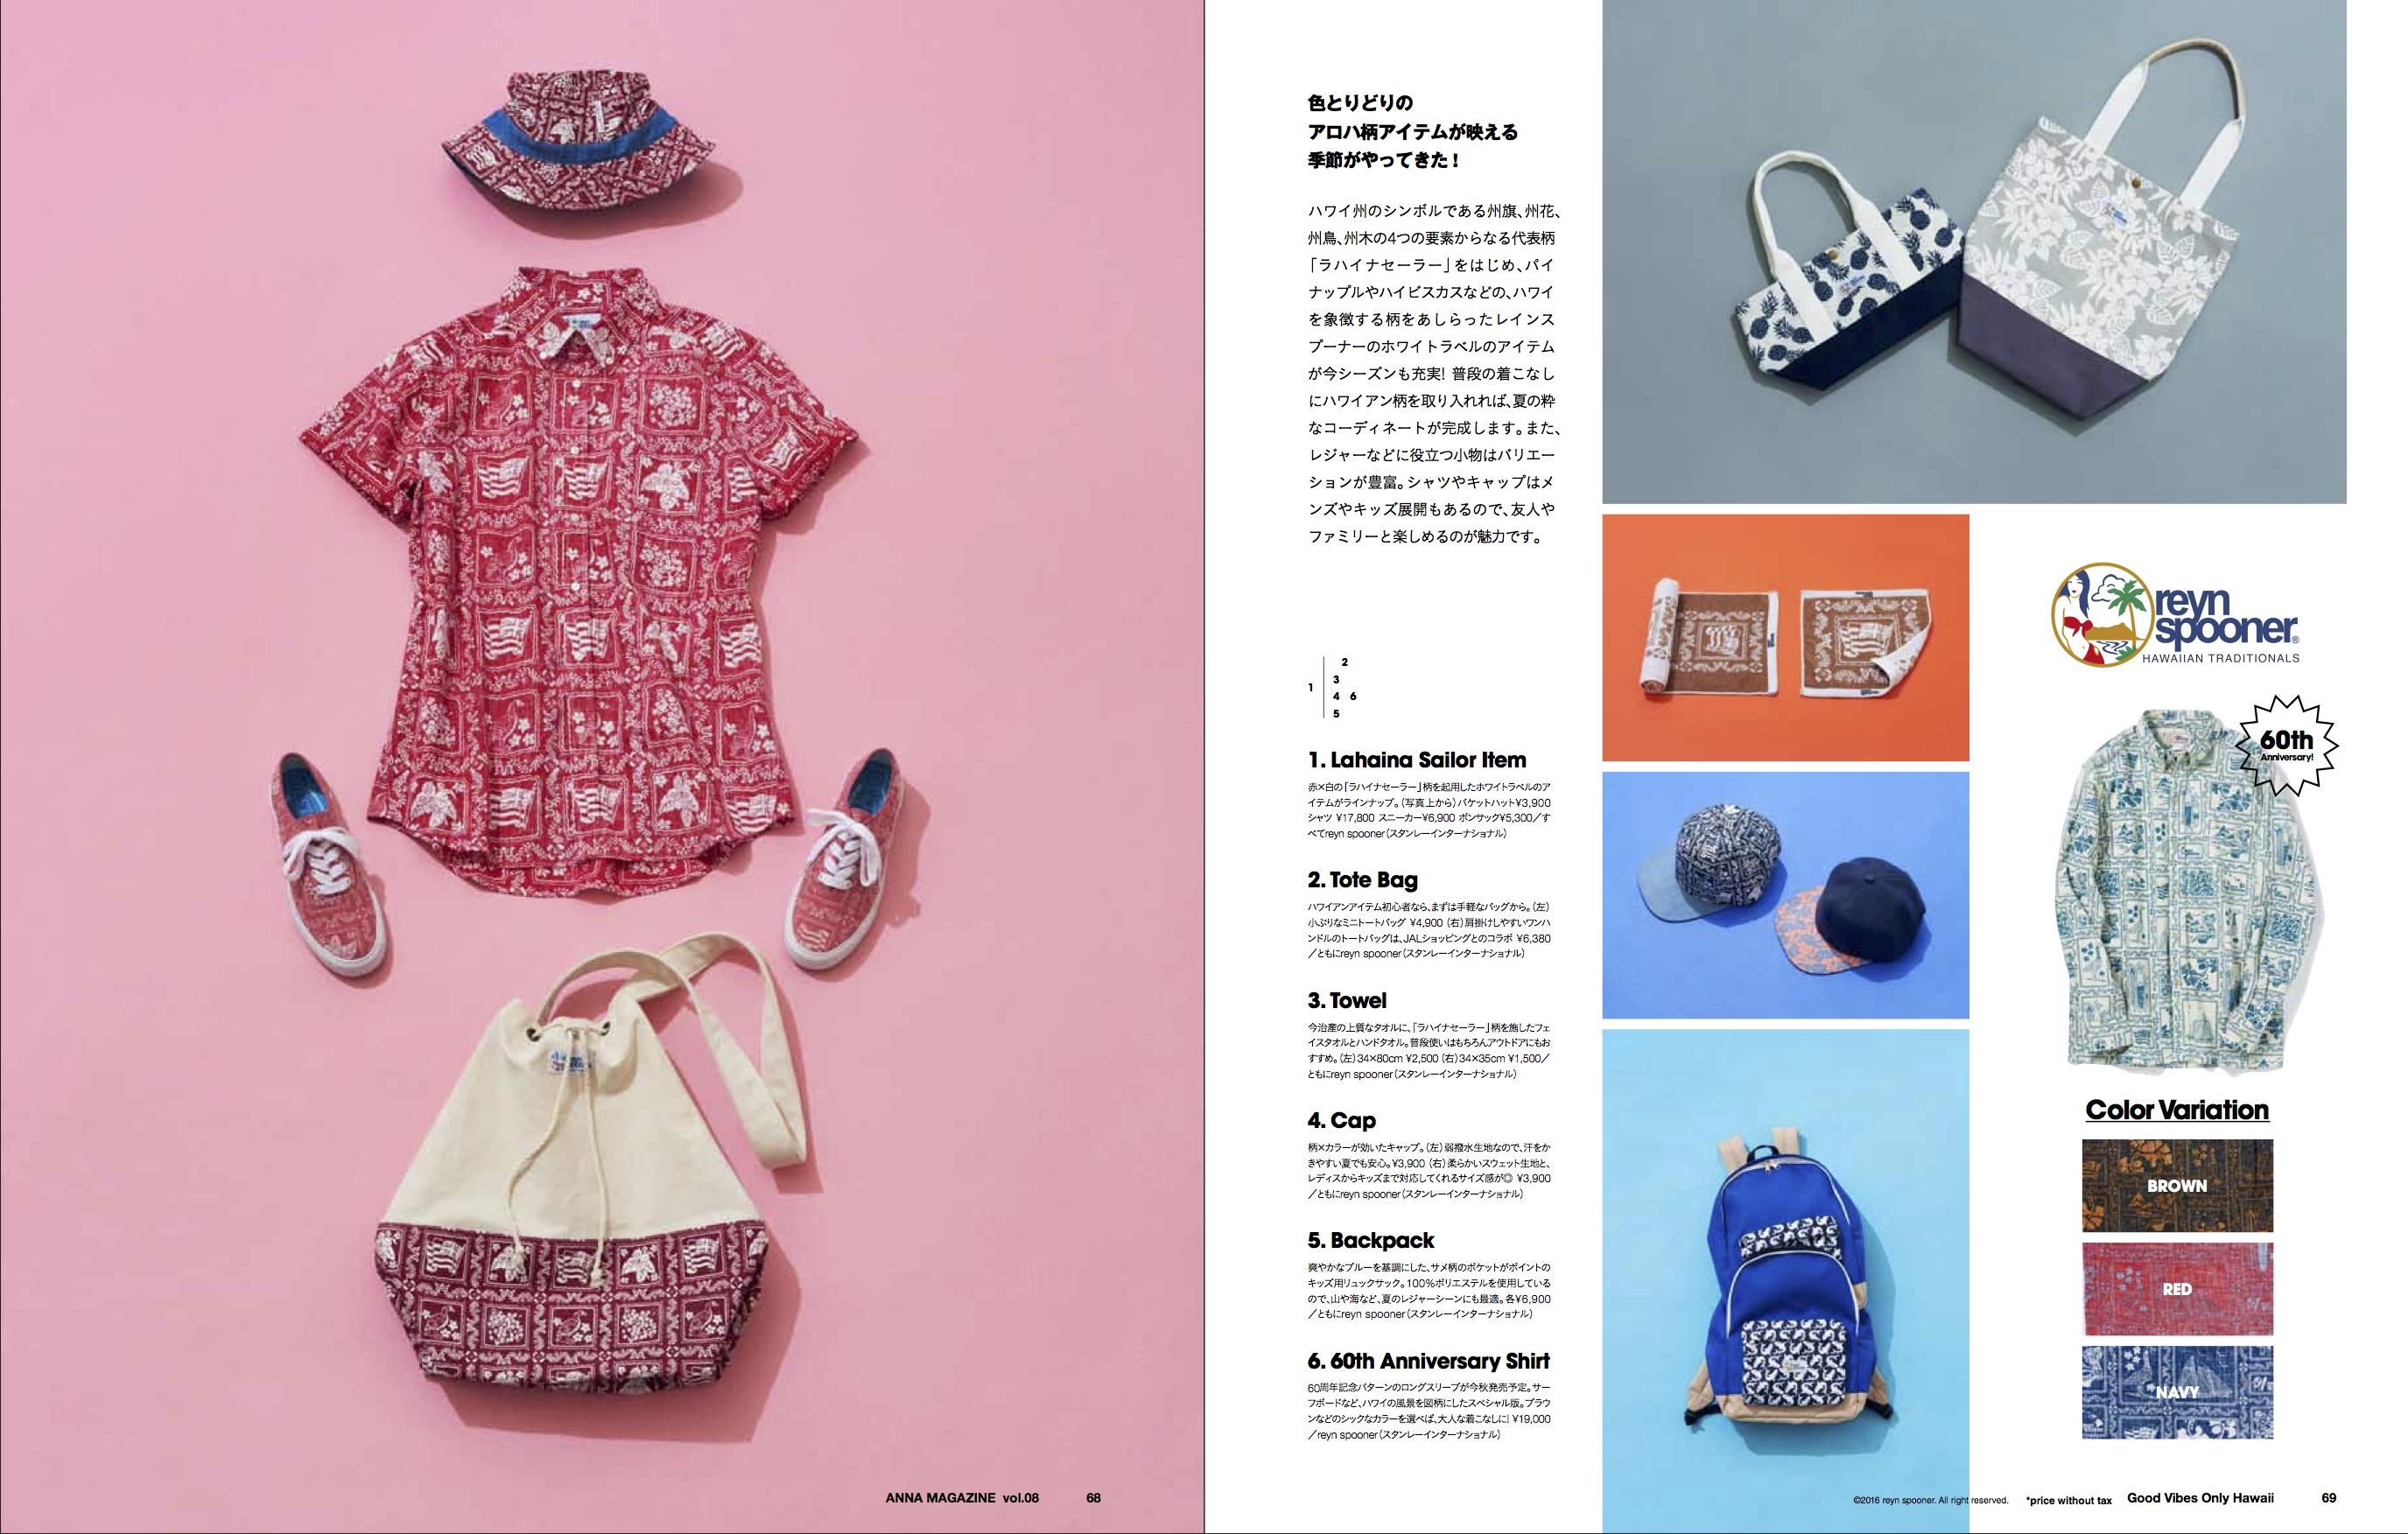 anna magazine vol.8 P33